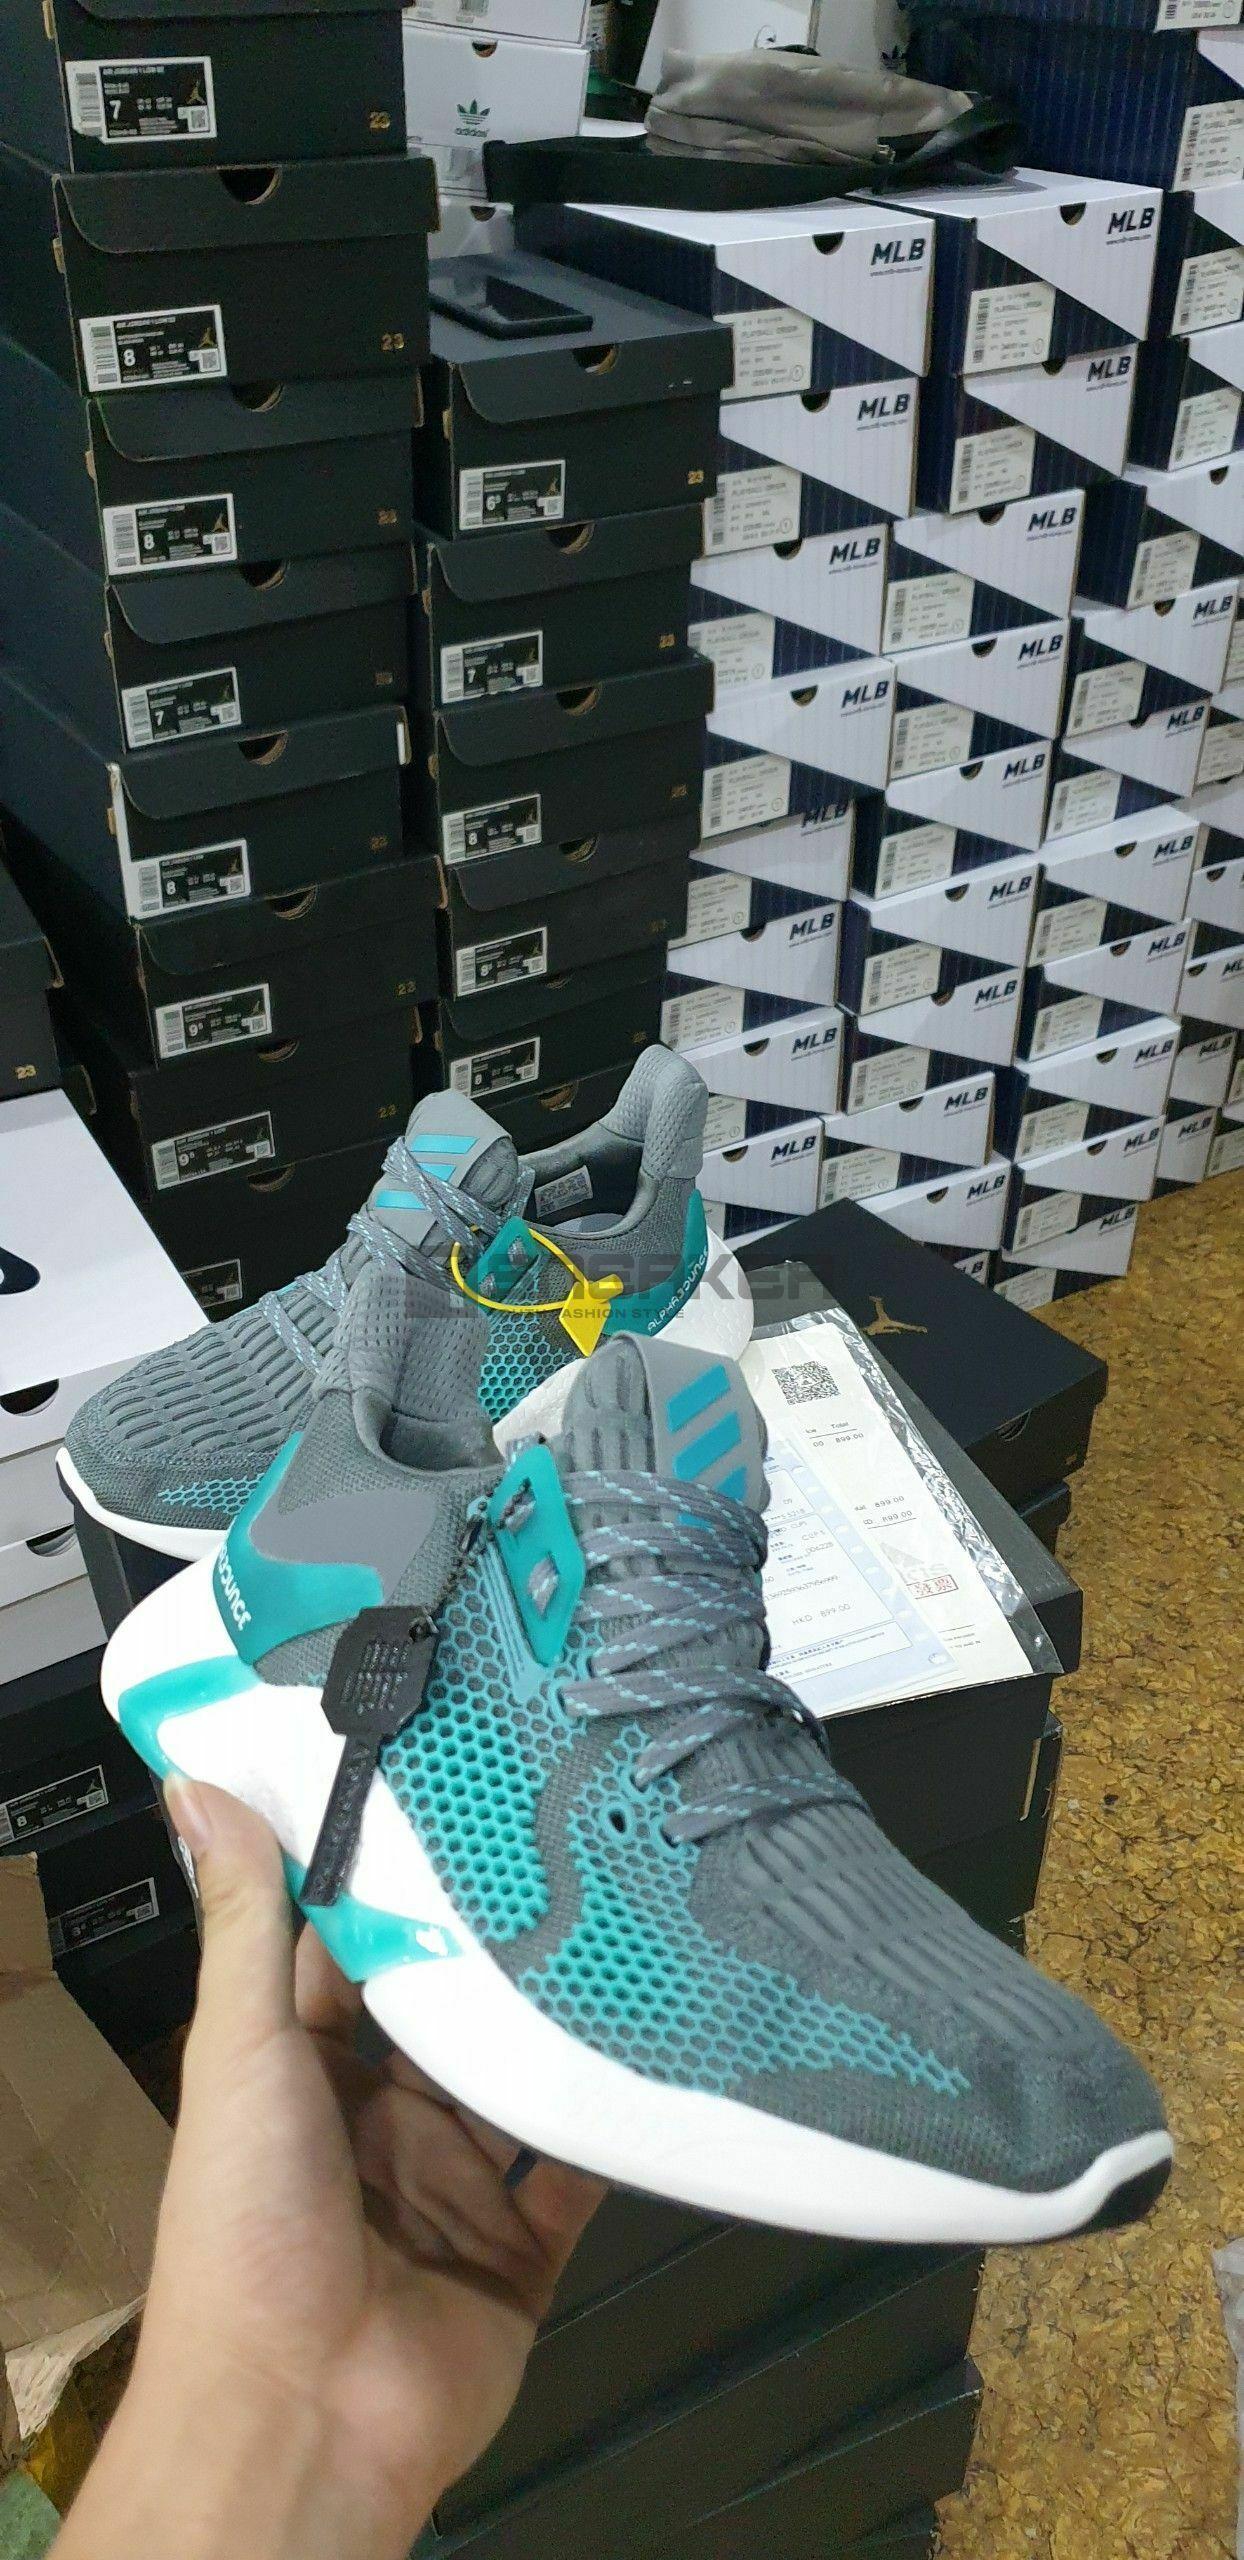 Mặt hông Giày Adidas Alphabounce Instinct M Xanh Xám